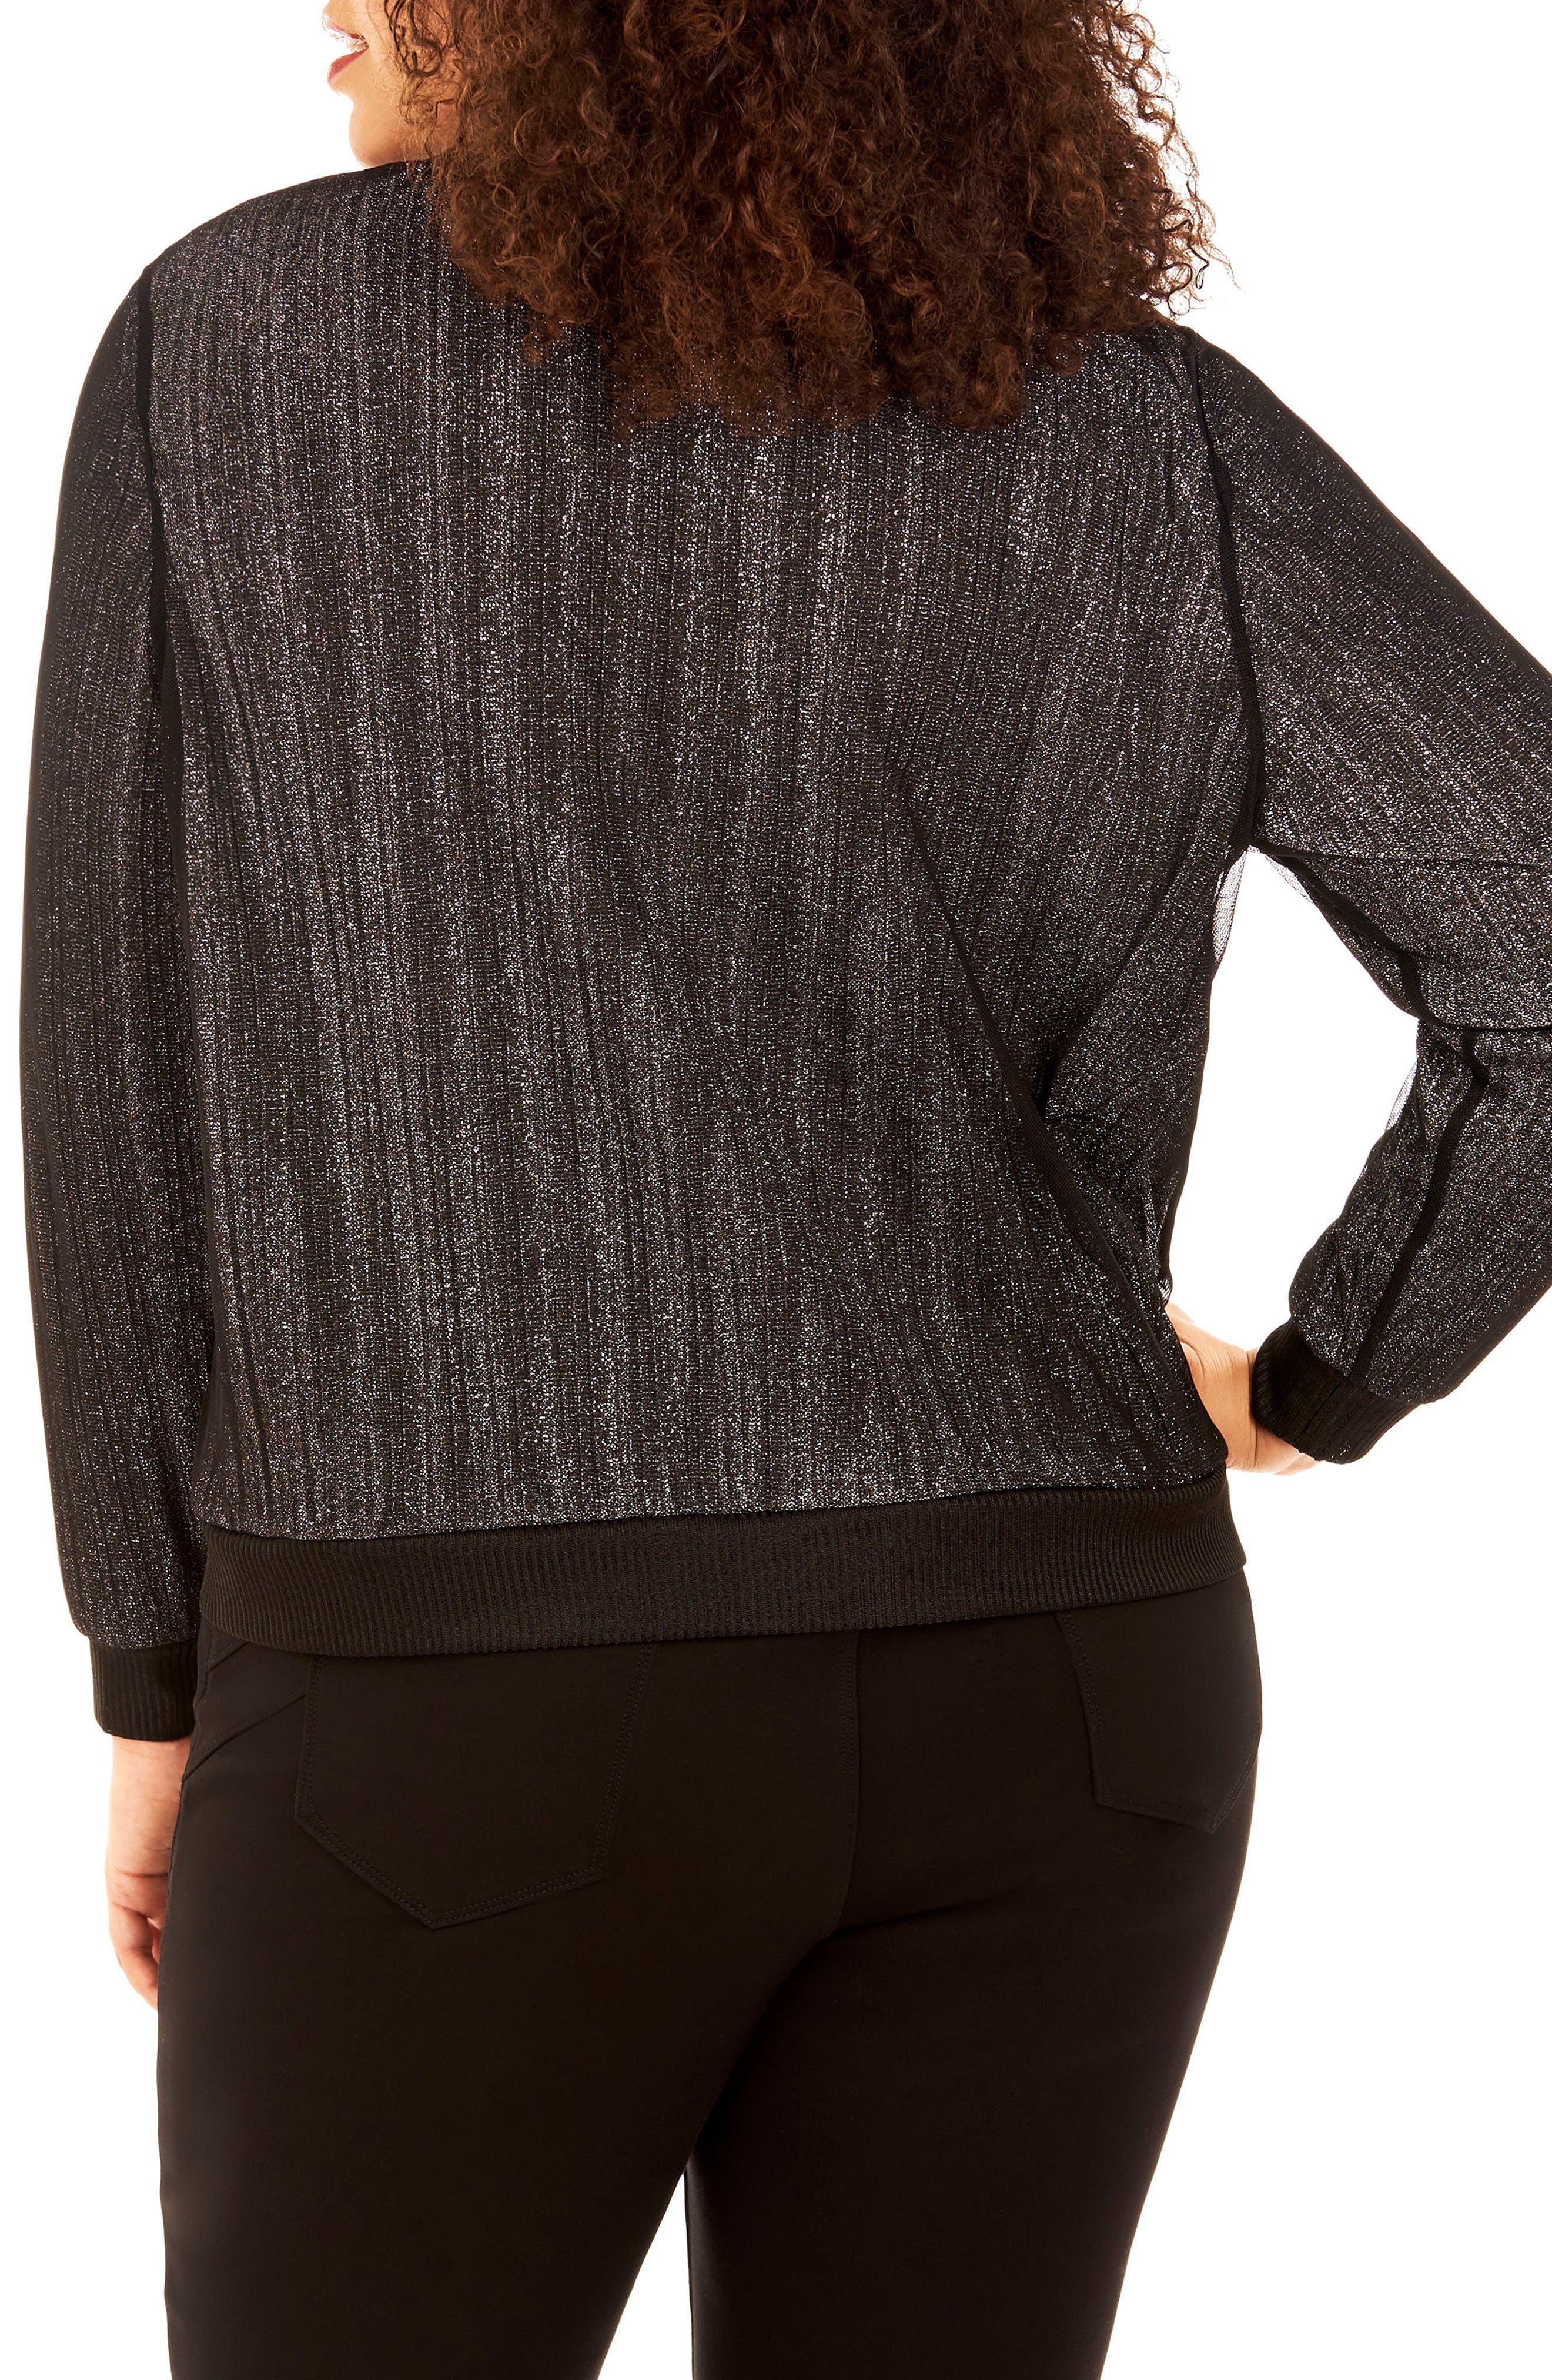 Glitter Knit Top,                             Alternate thumbnail 2, color,                             Silver/ Black